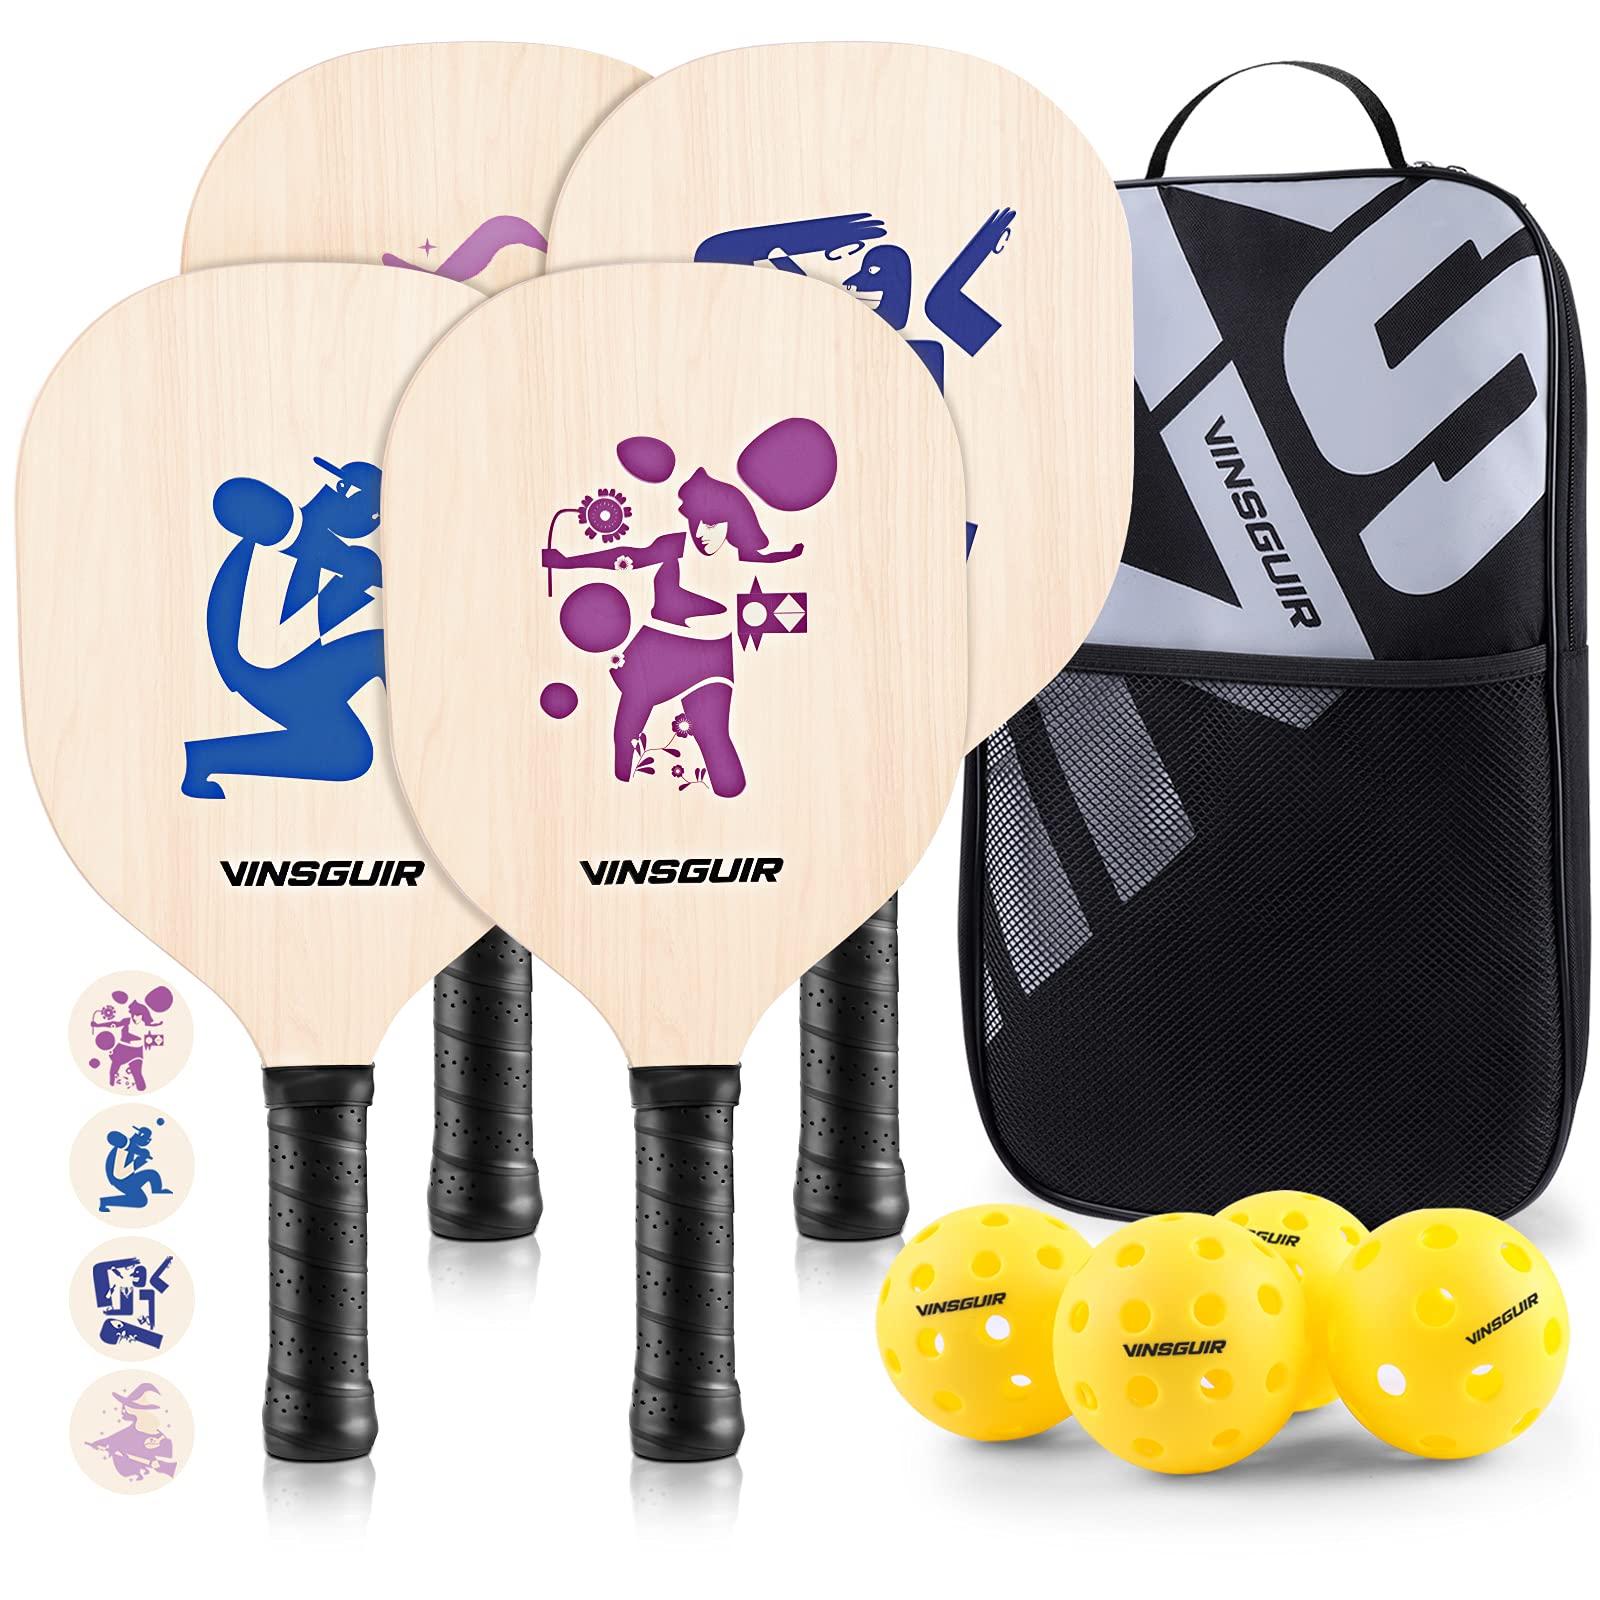 VINSGUIR Pickleball Set with 4 Rackets and 4 Balls Picklebal